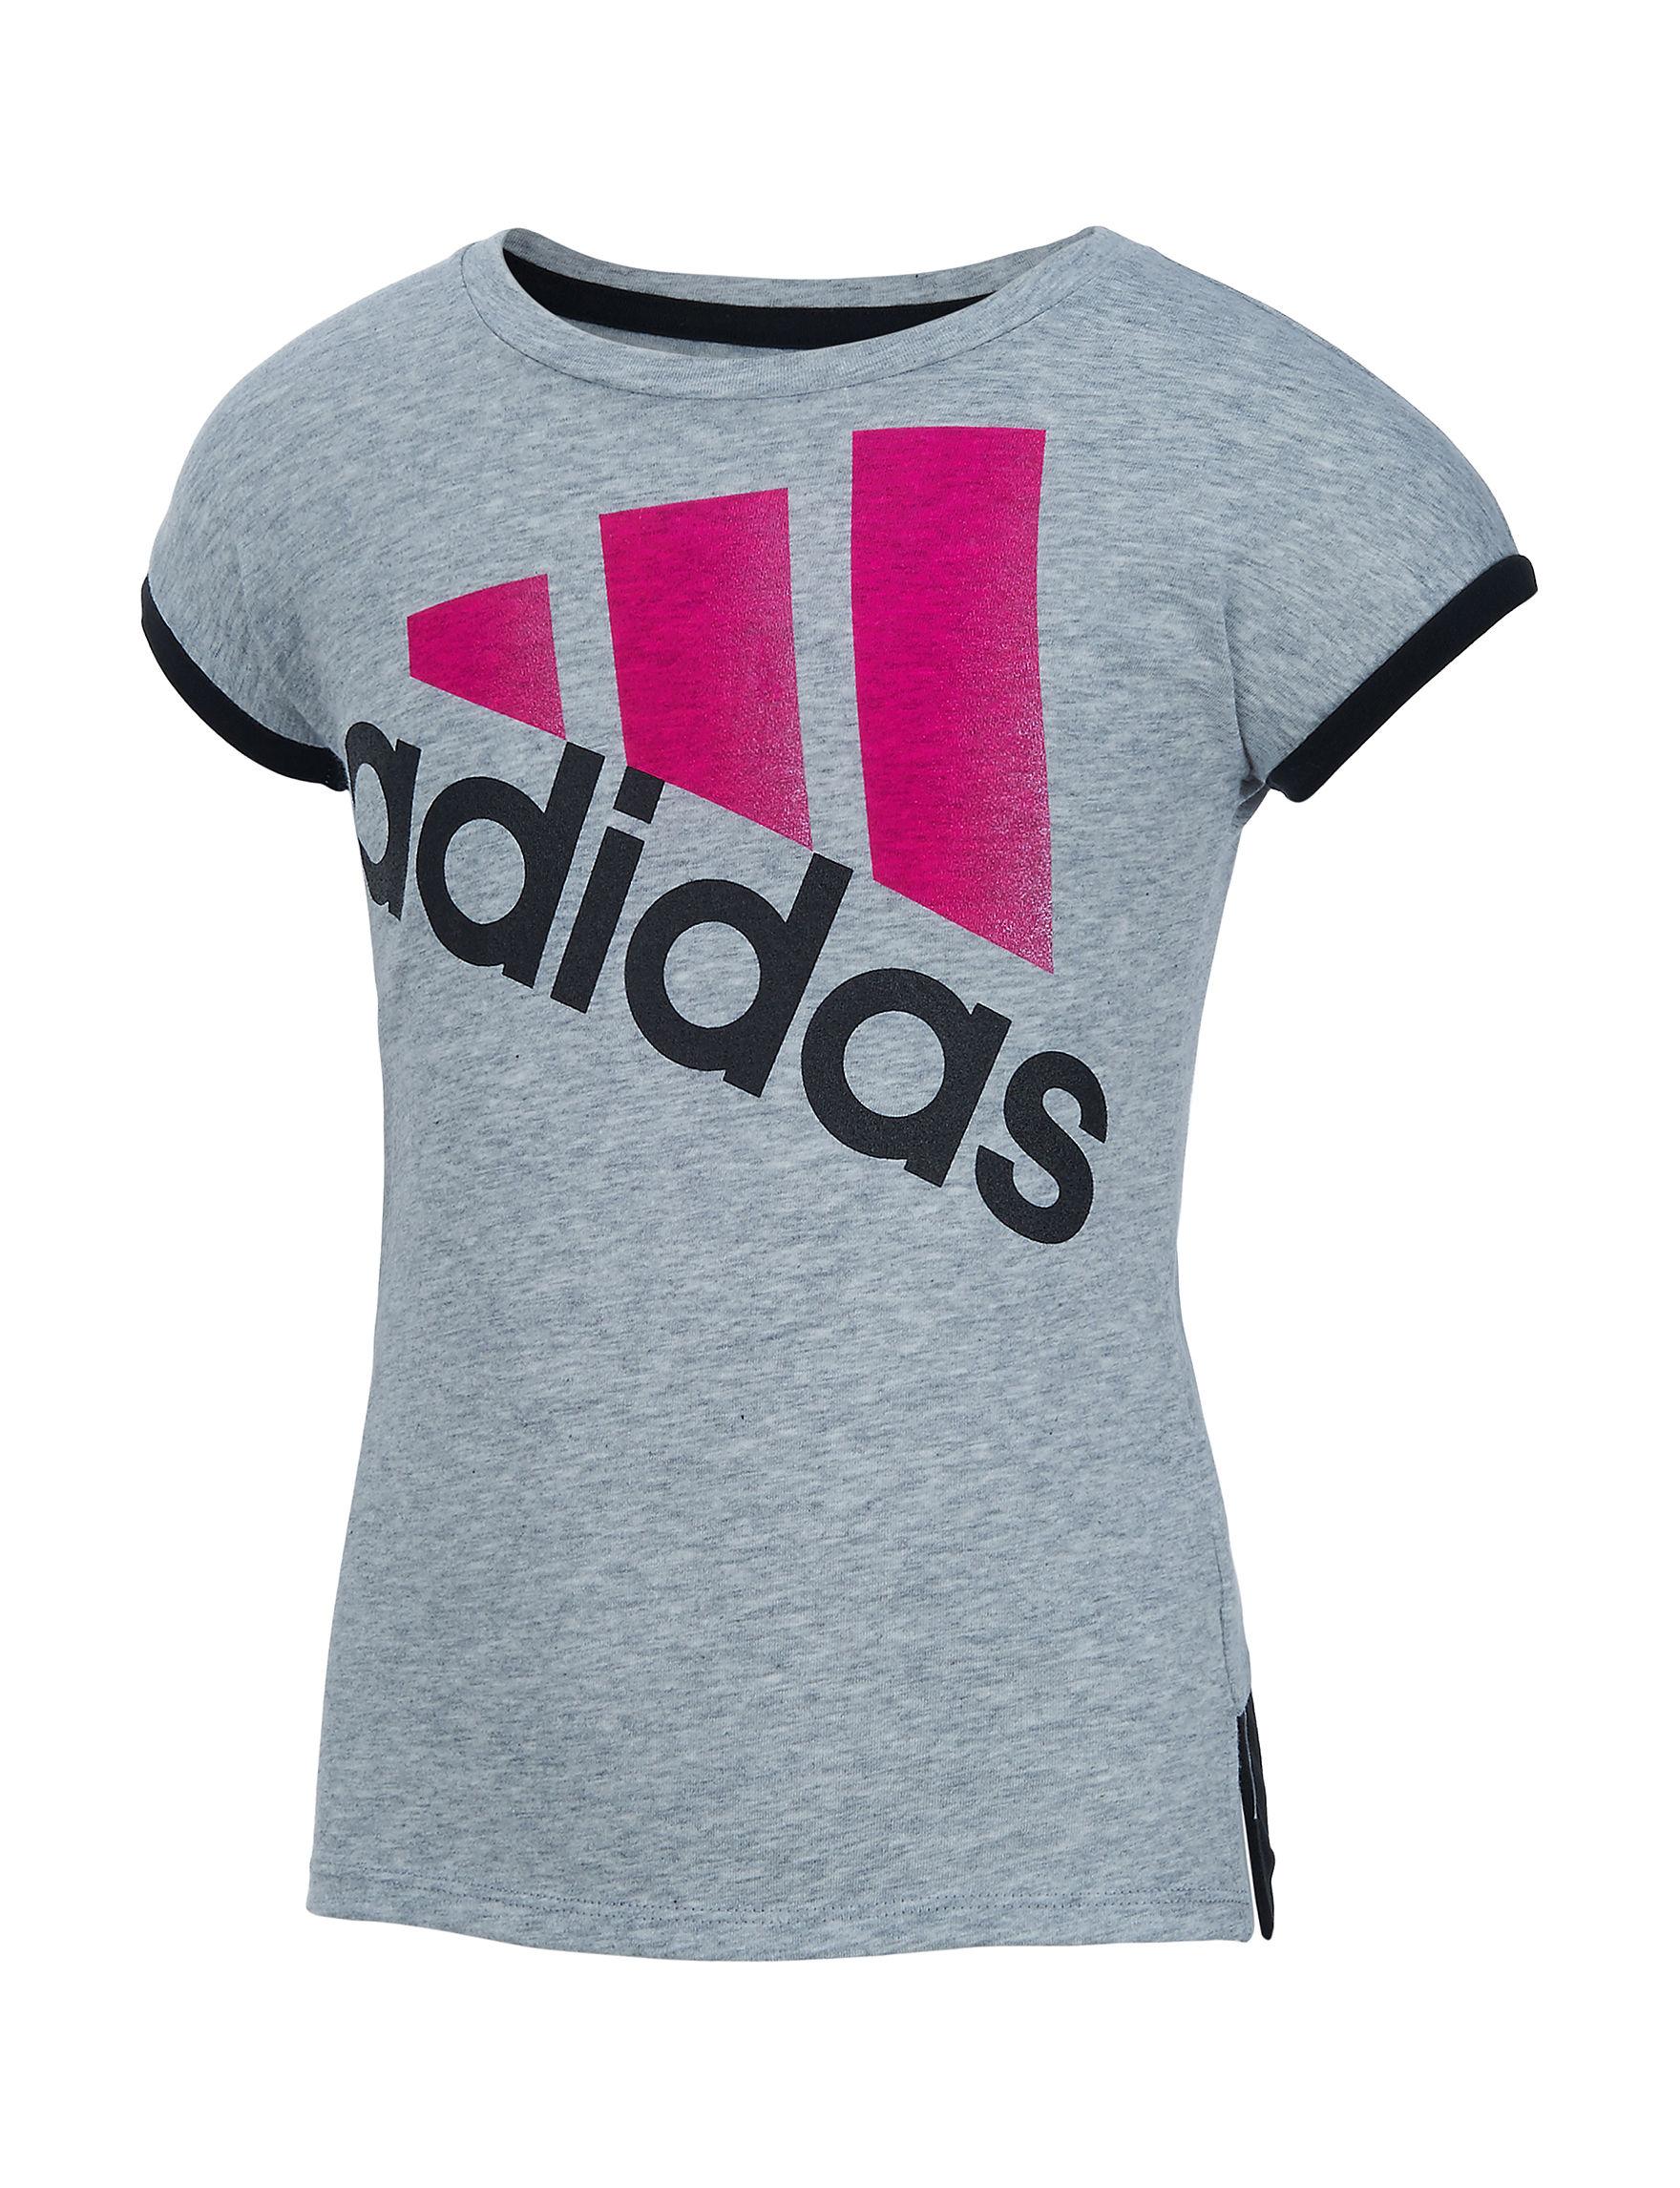 Adidas Medium Grey Tees & Tanks